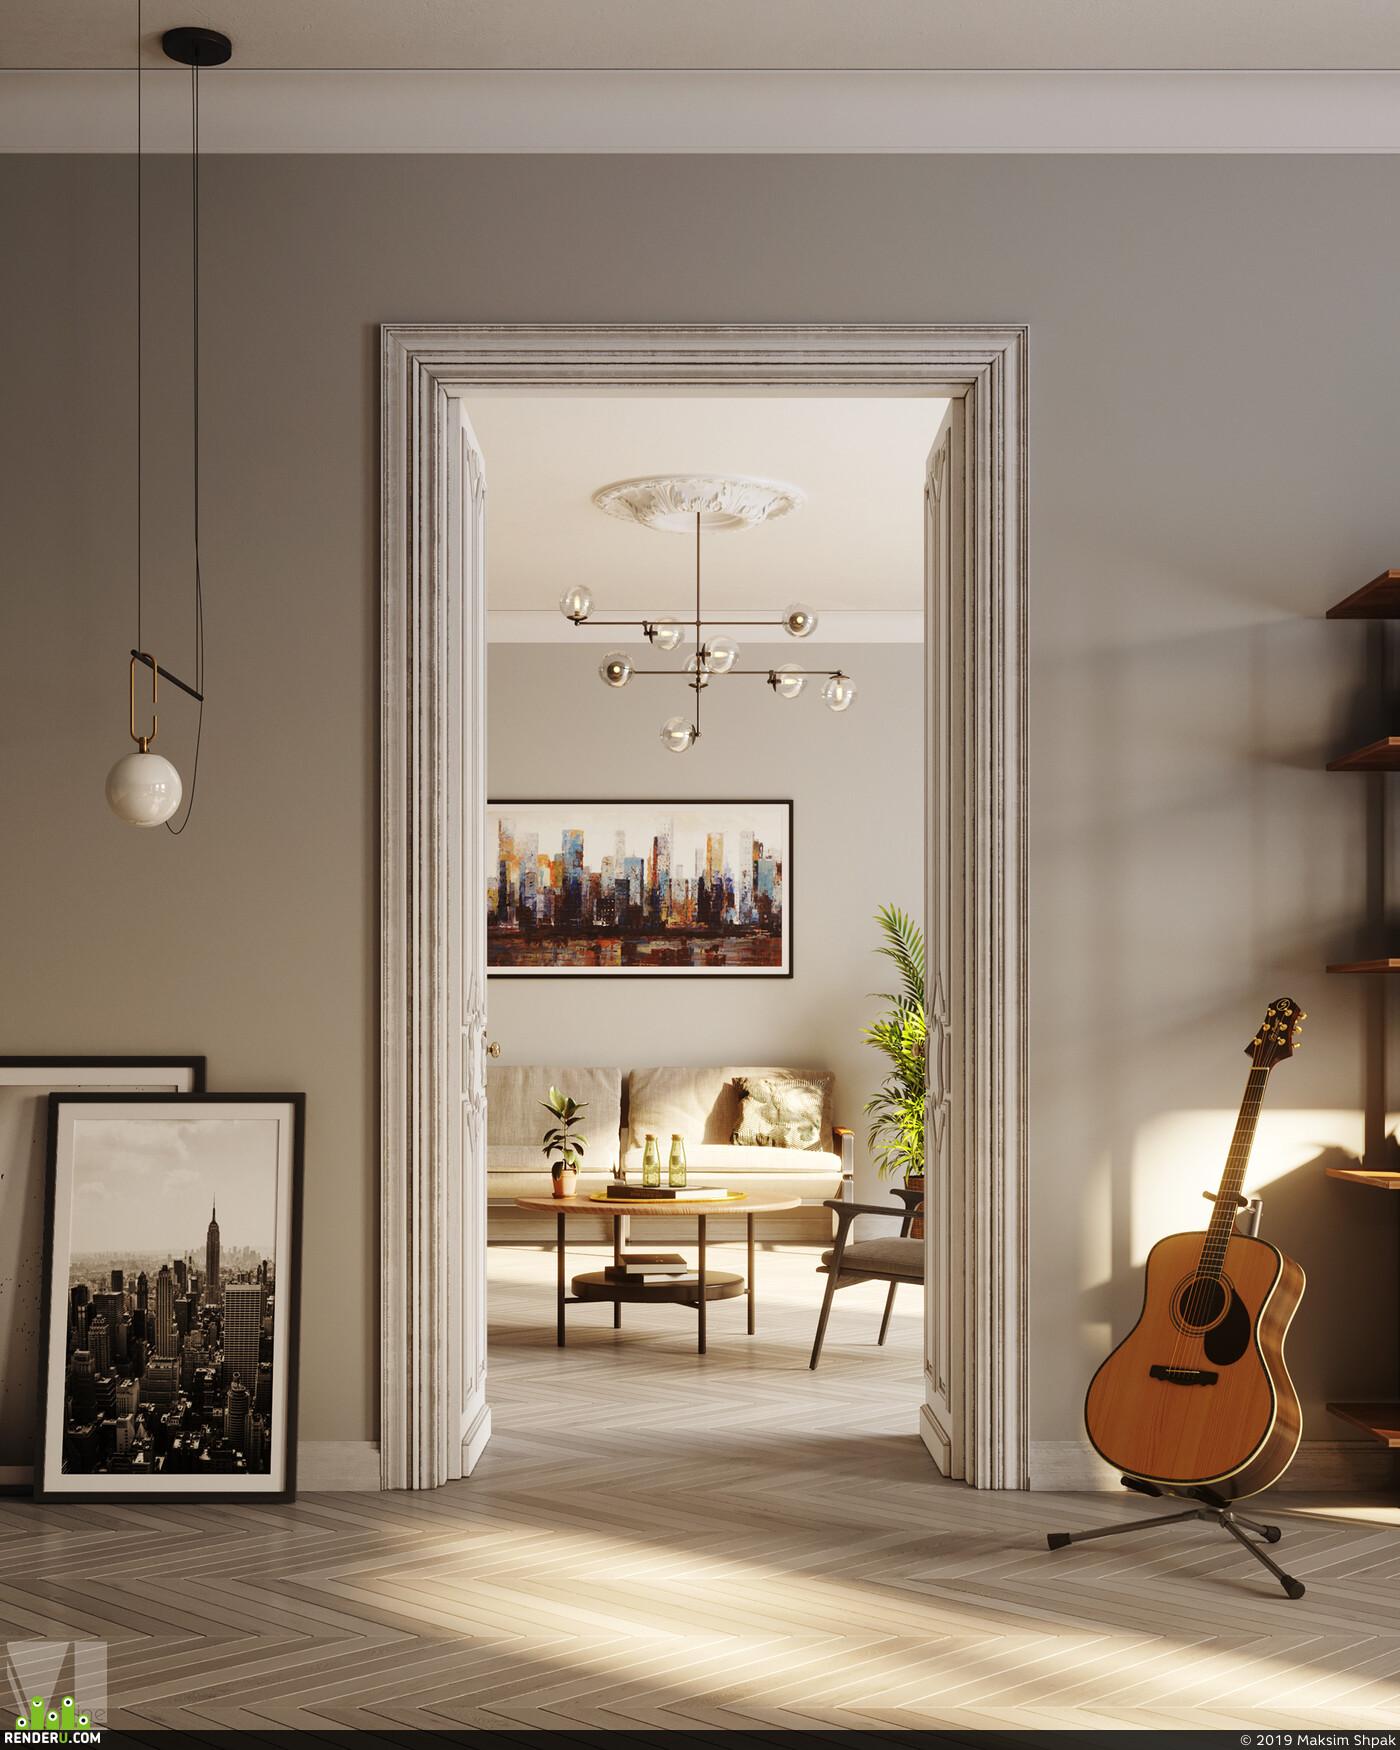 vizlinestudio, VIZUALISATION, 3dviz, interior, Corona Renderer, 3Dsmax